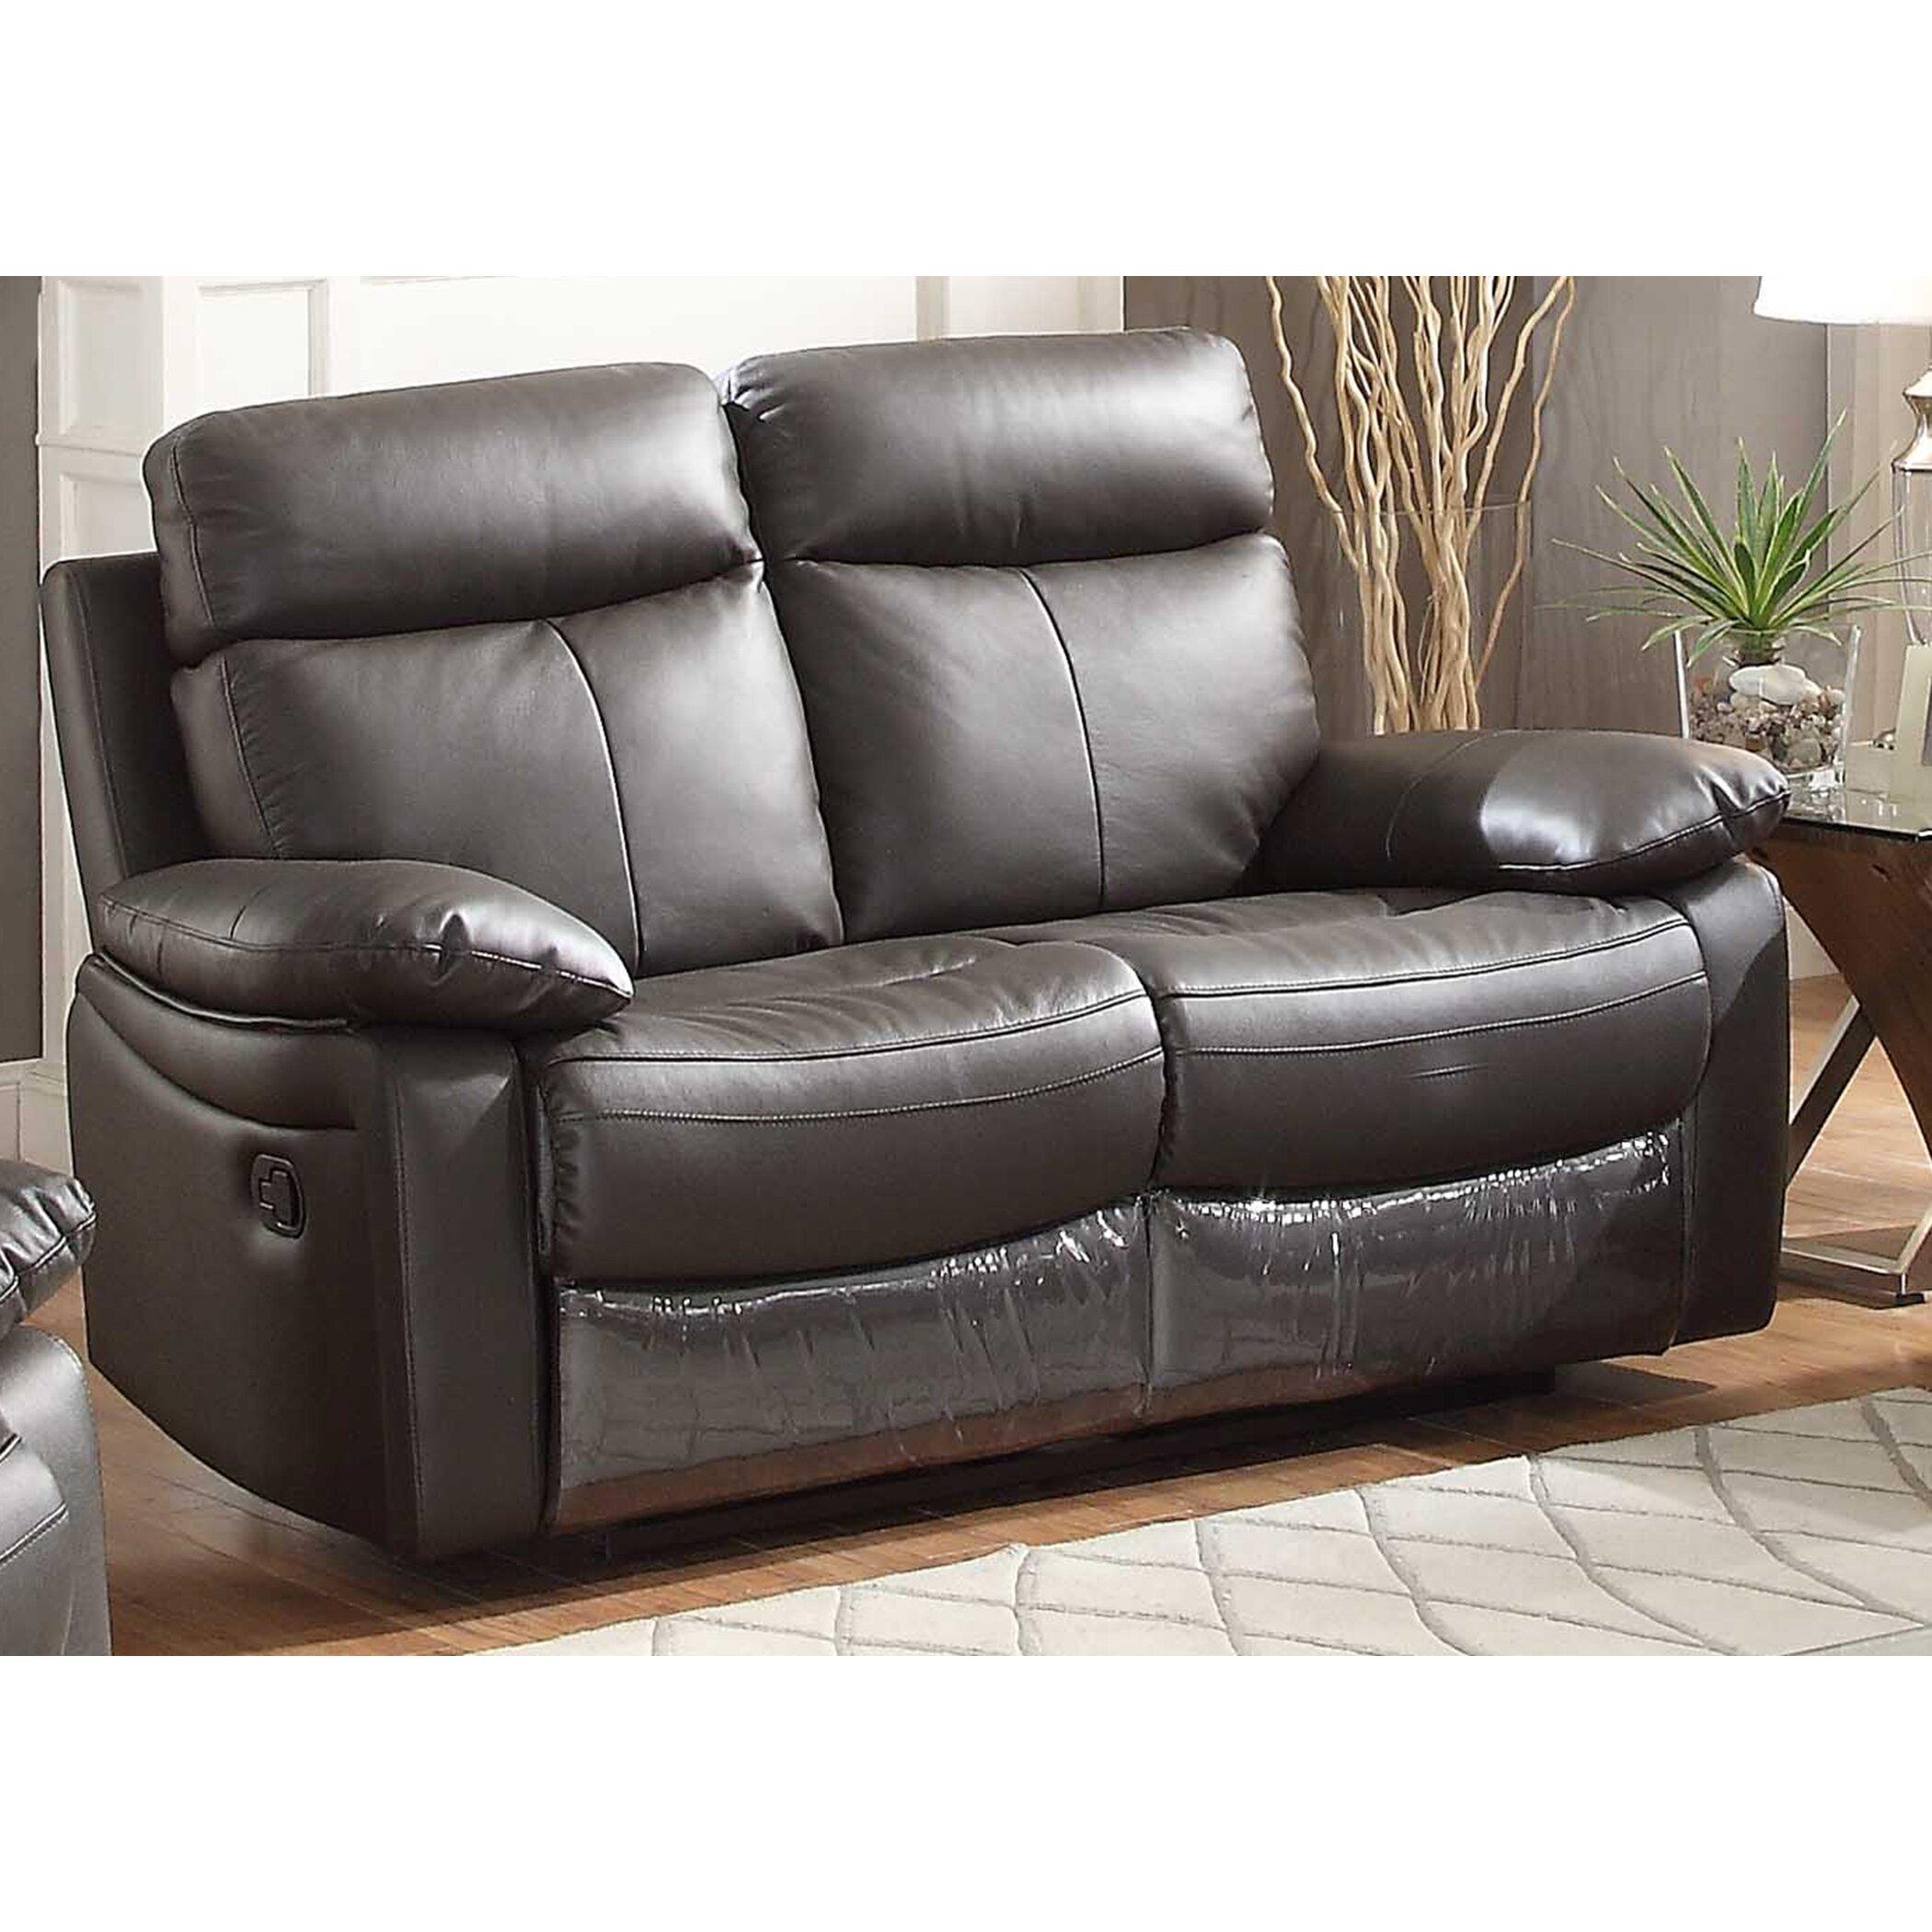 ac pacific ryker 3 piece living room set | wayfair